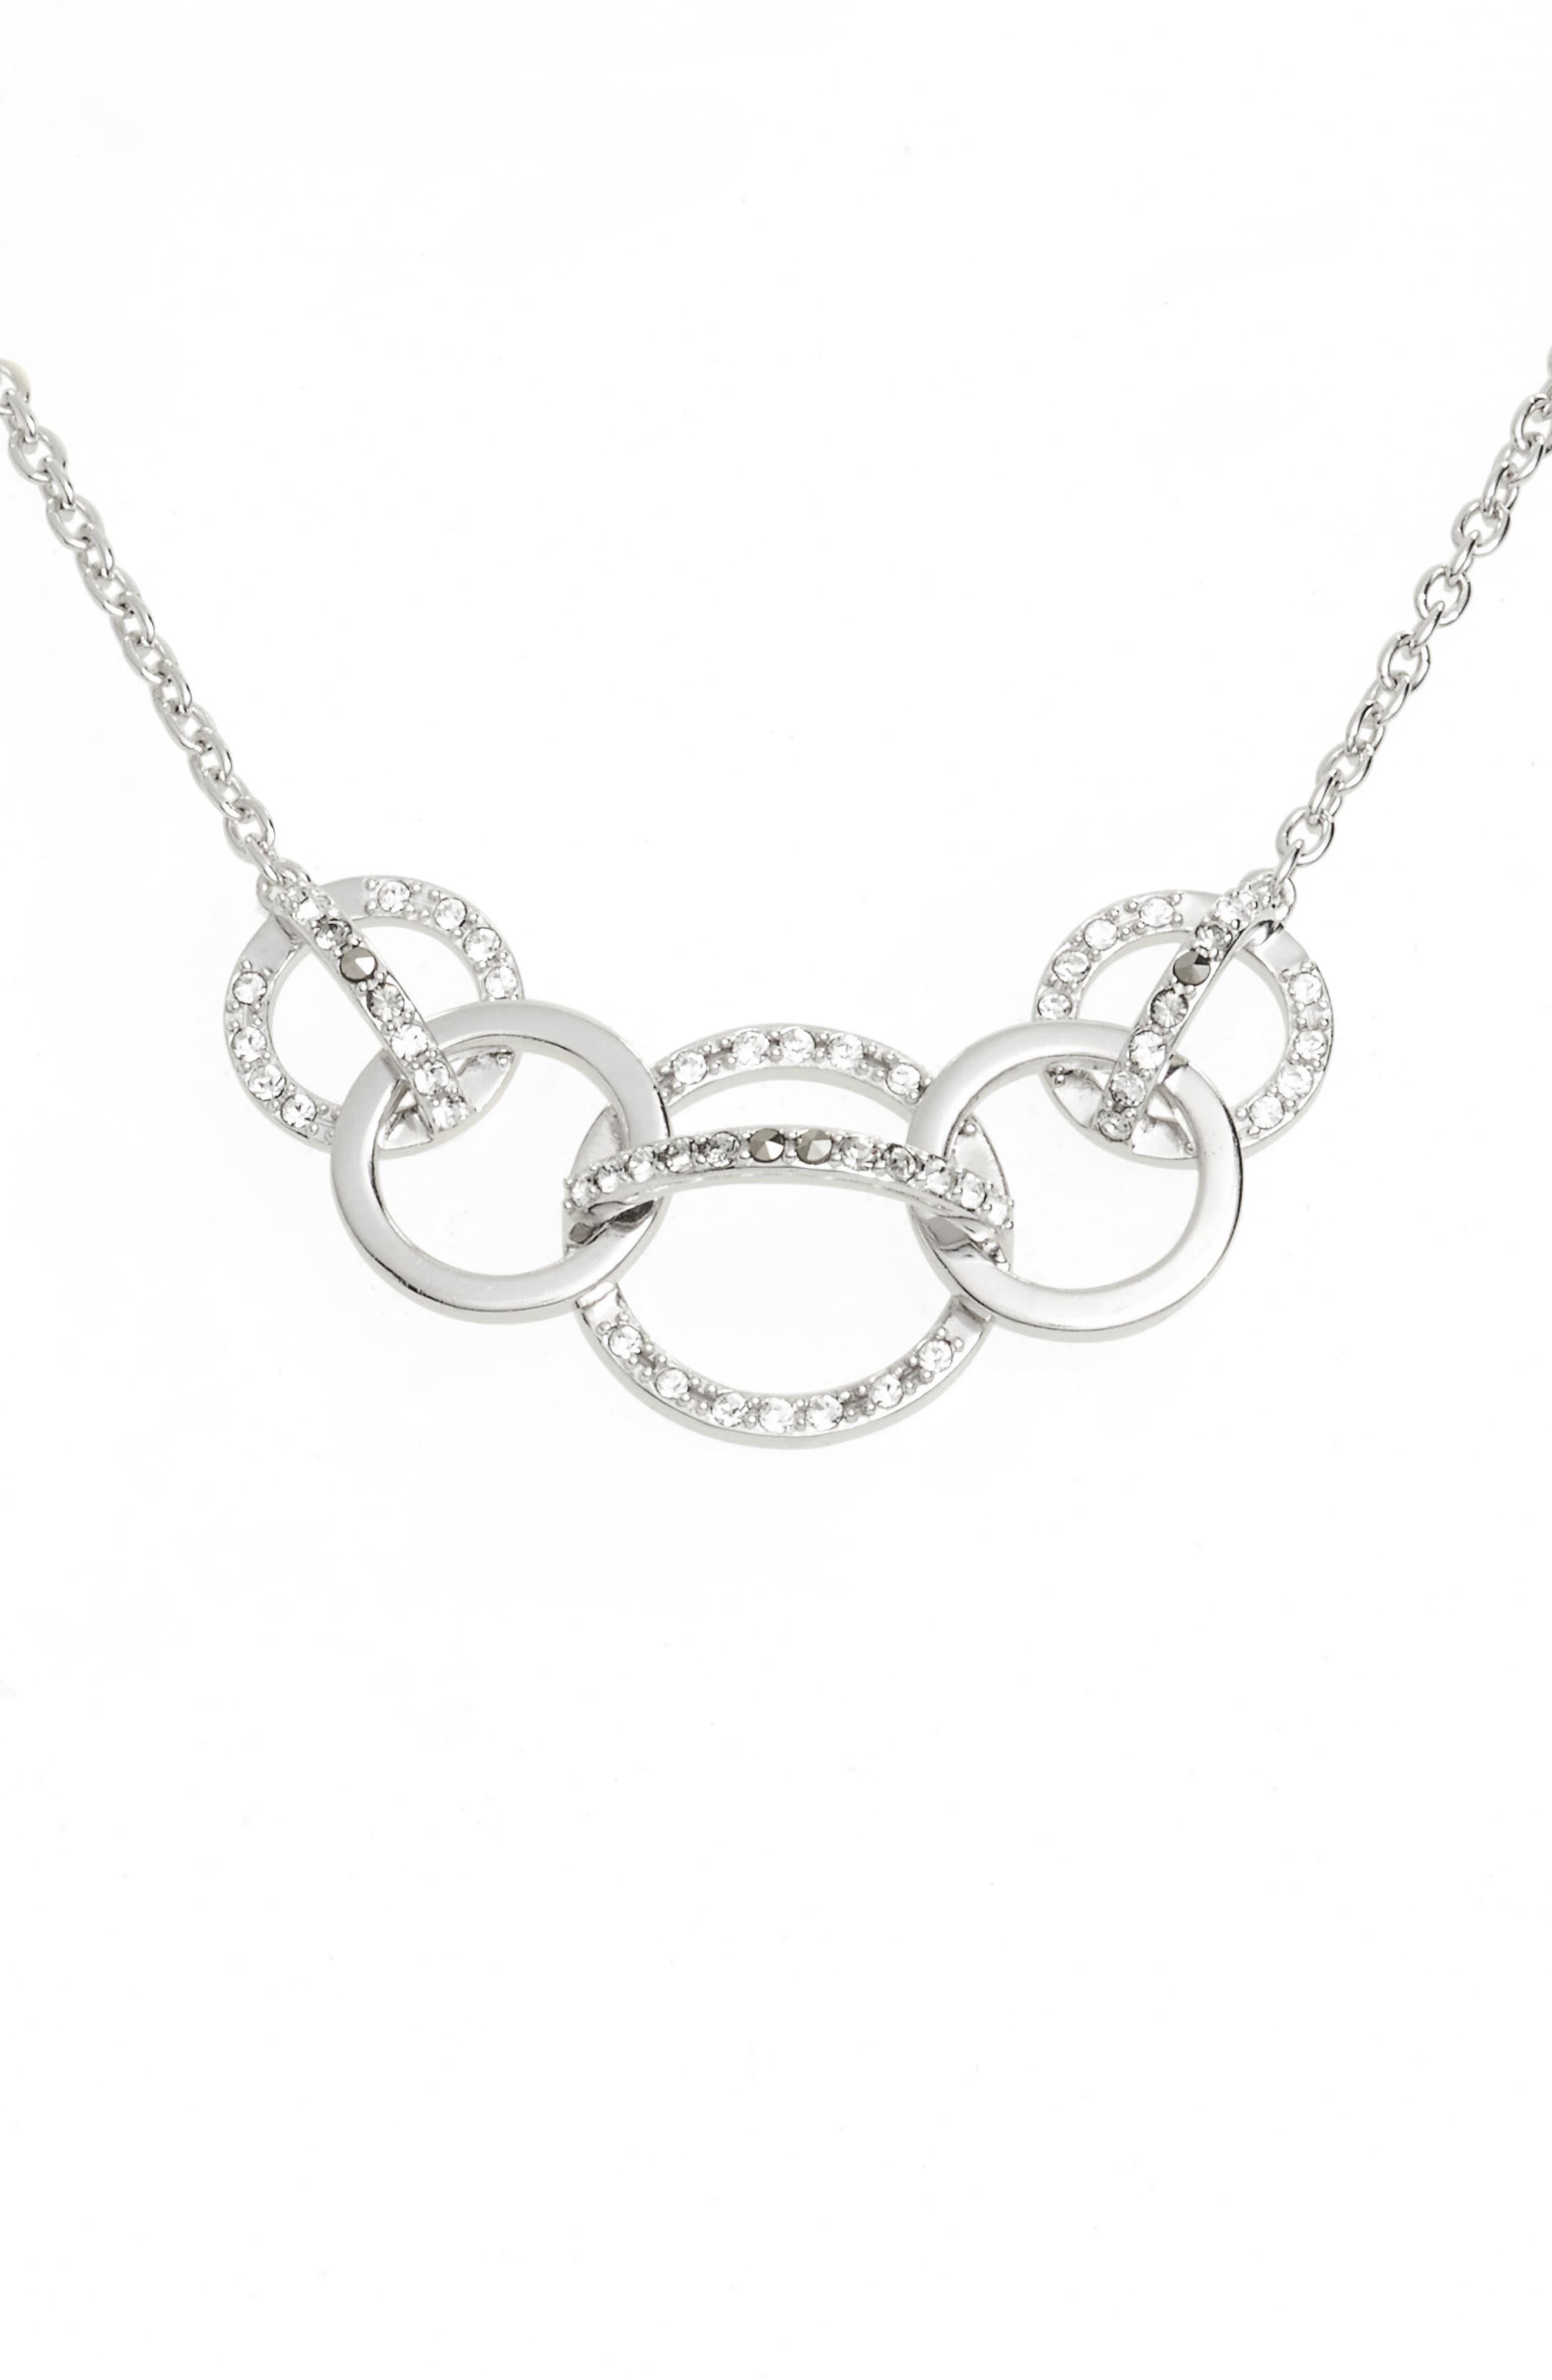 Judith Jack Silver Sparkle Crystal Collar Necklace